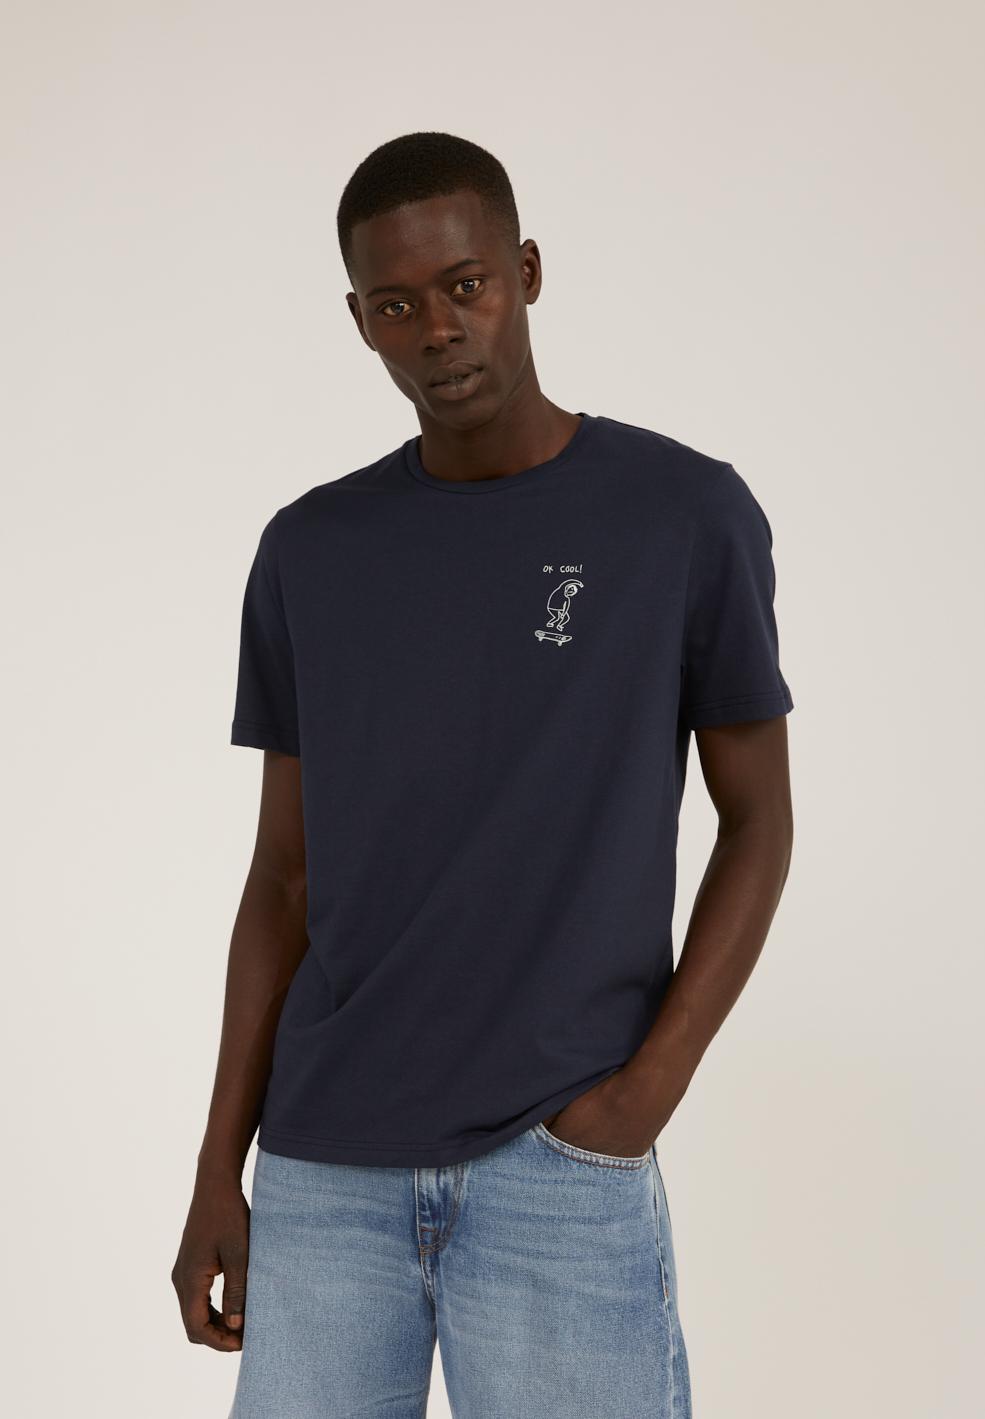 Armedangels  JAAMES OK COOL T-Shirt aus Bio-Baumwolle navy